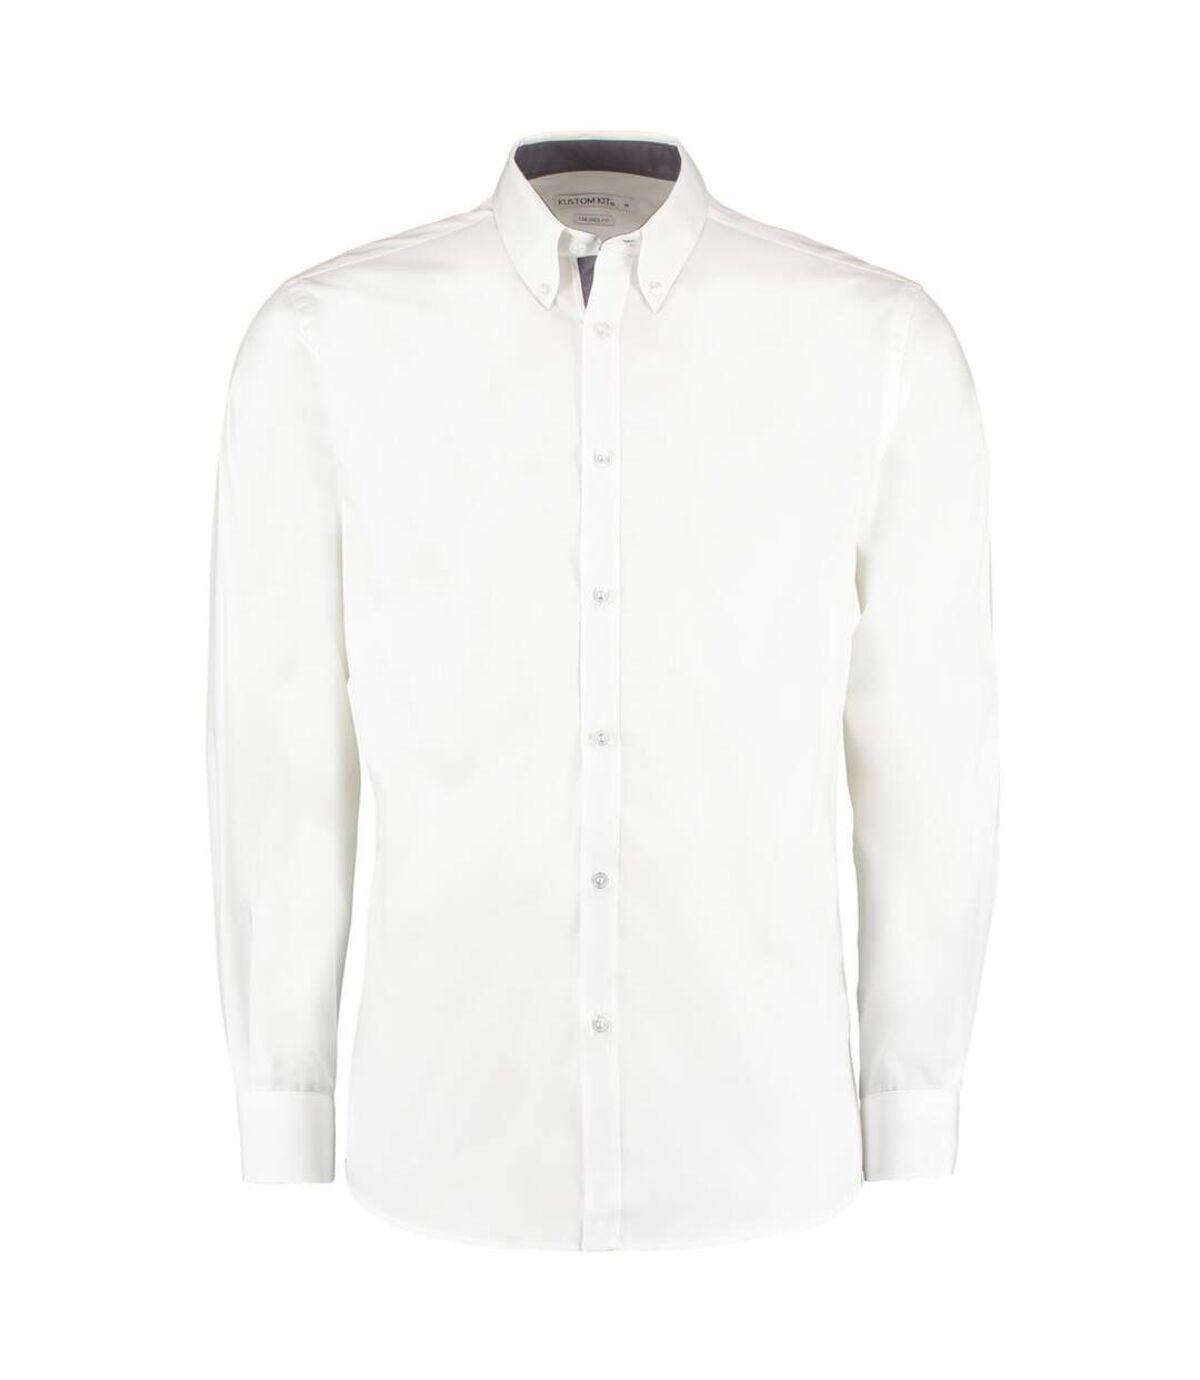 Kustom Kit Mens Contrast Premium Oxford Shirt (White/Navy) - UTBC2682